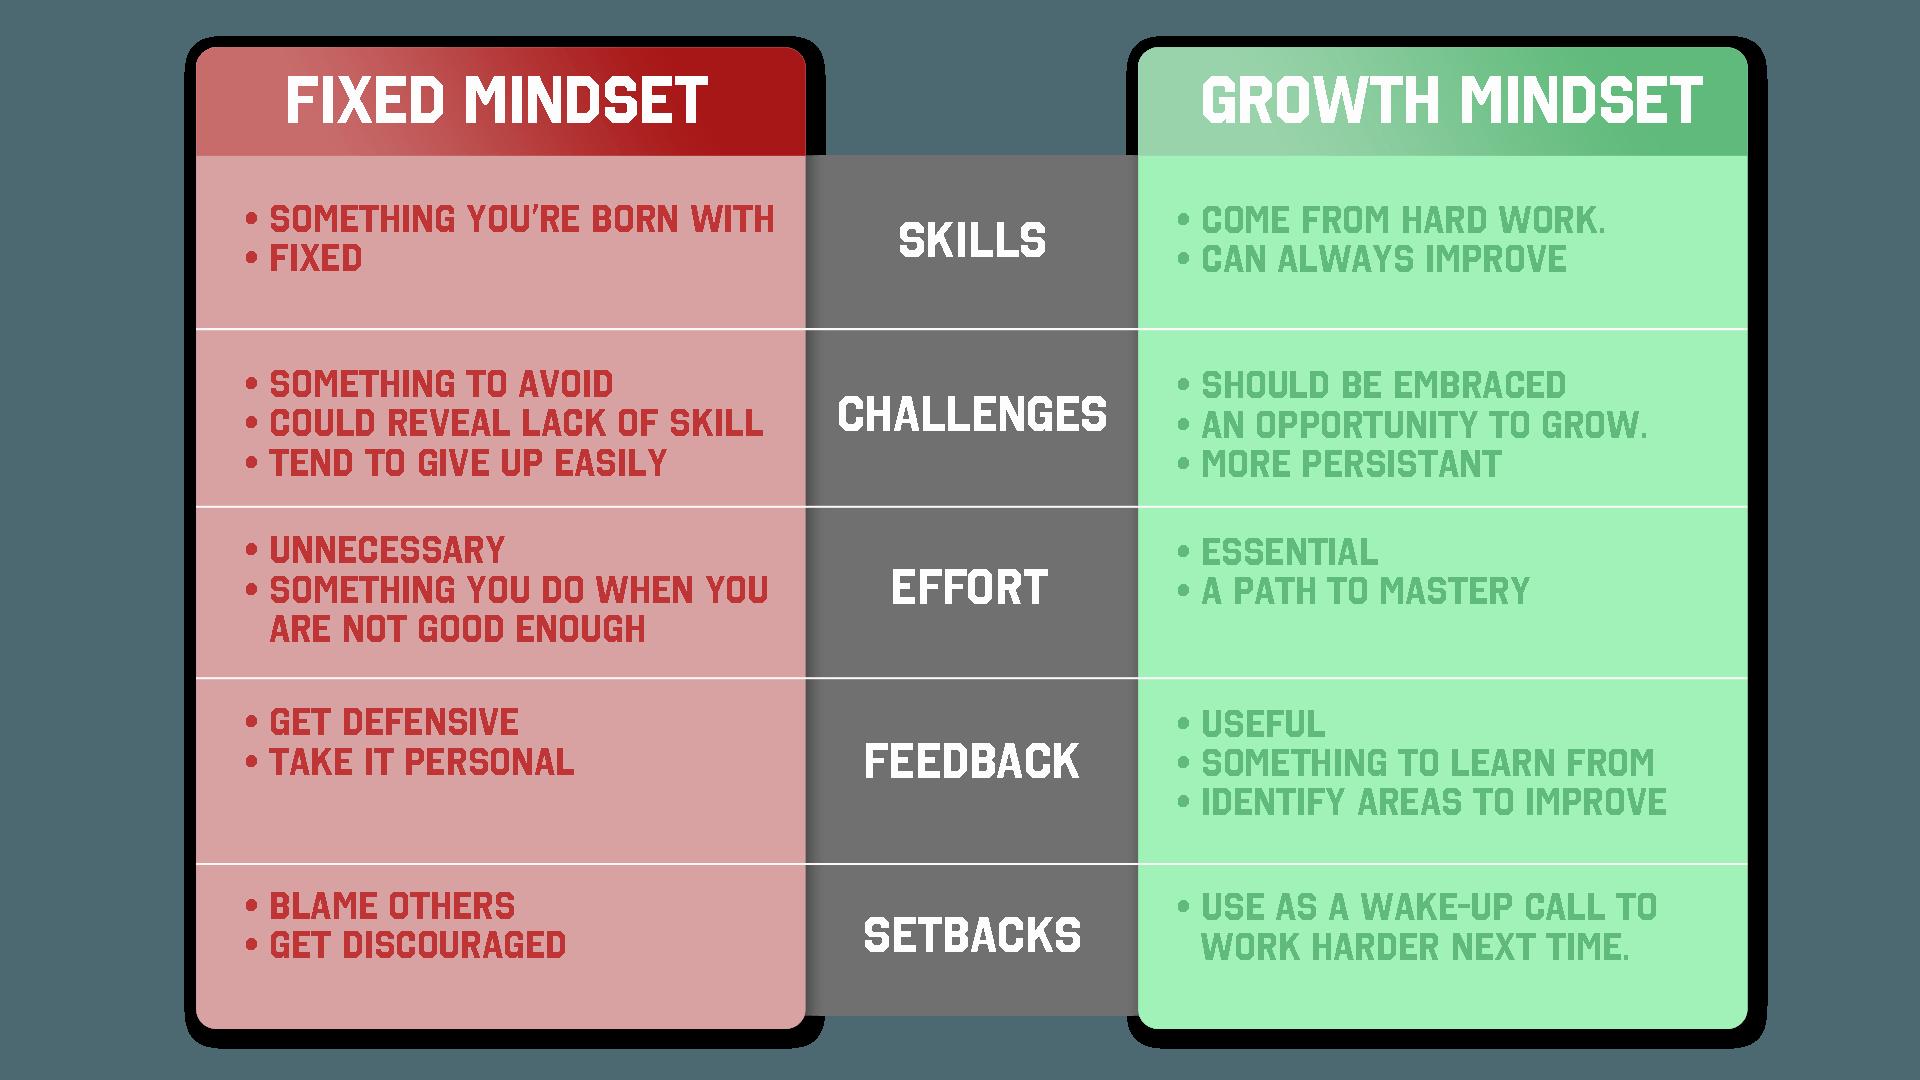 GrowthMindsetModel